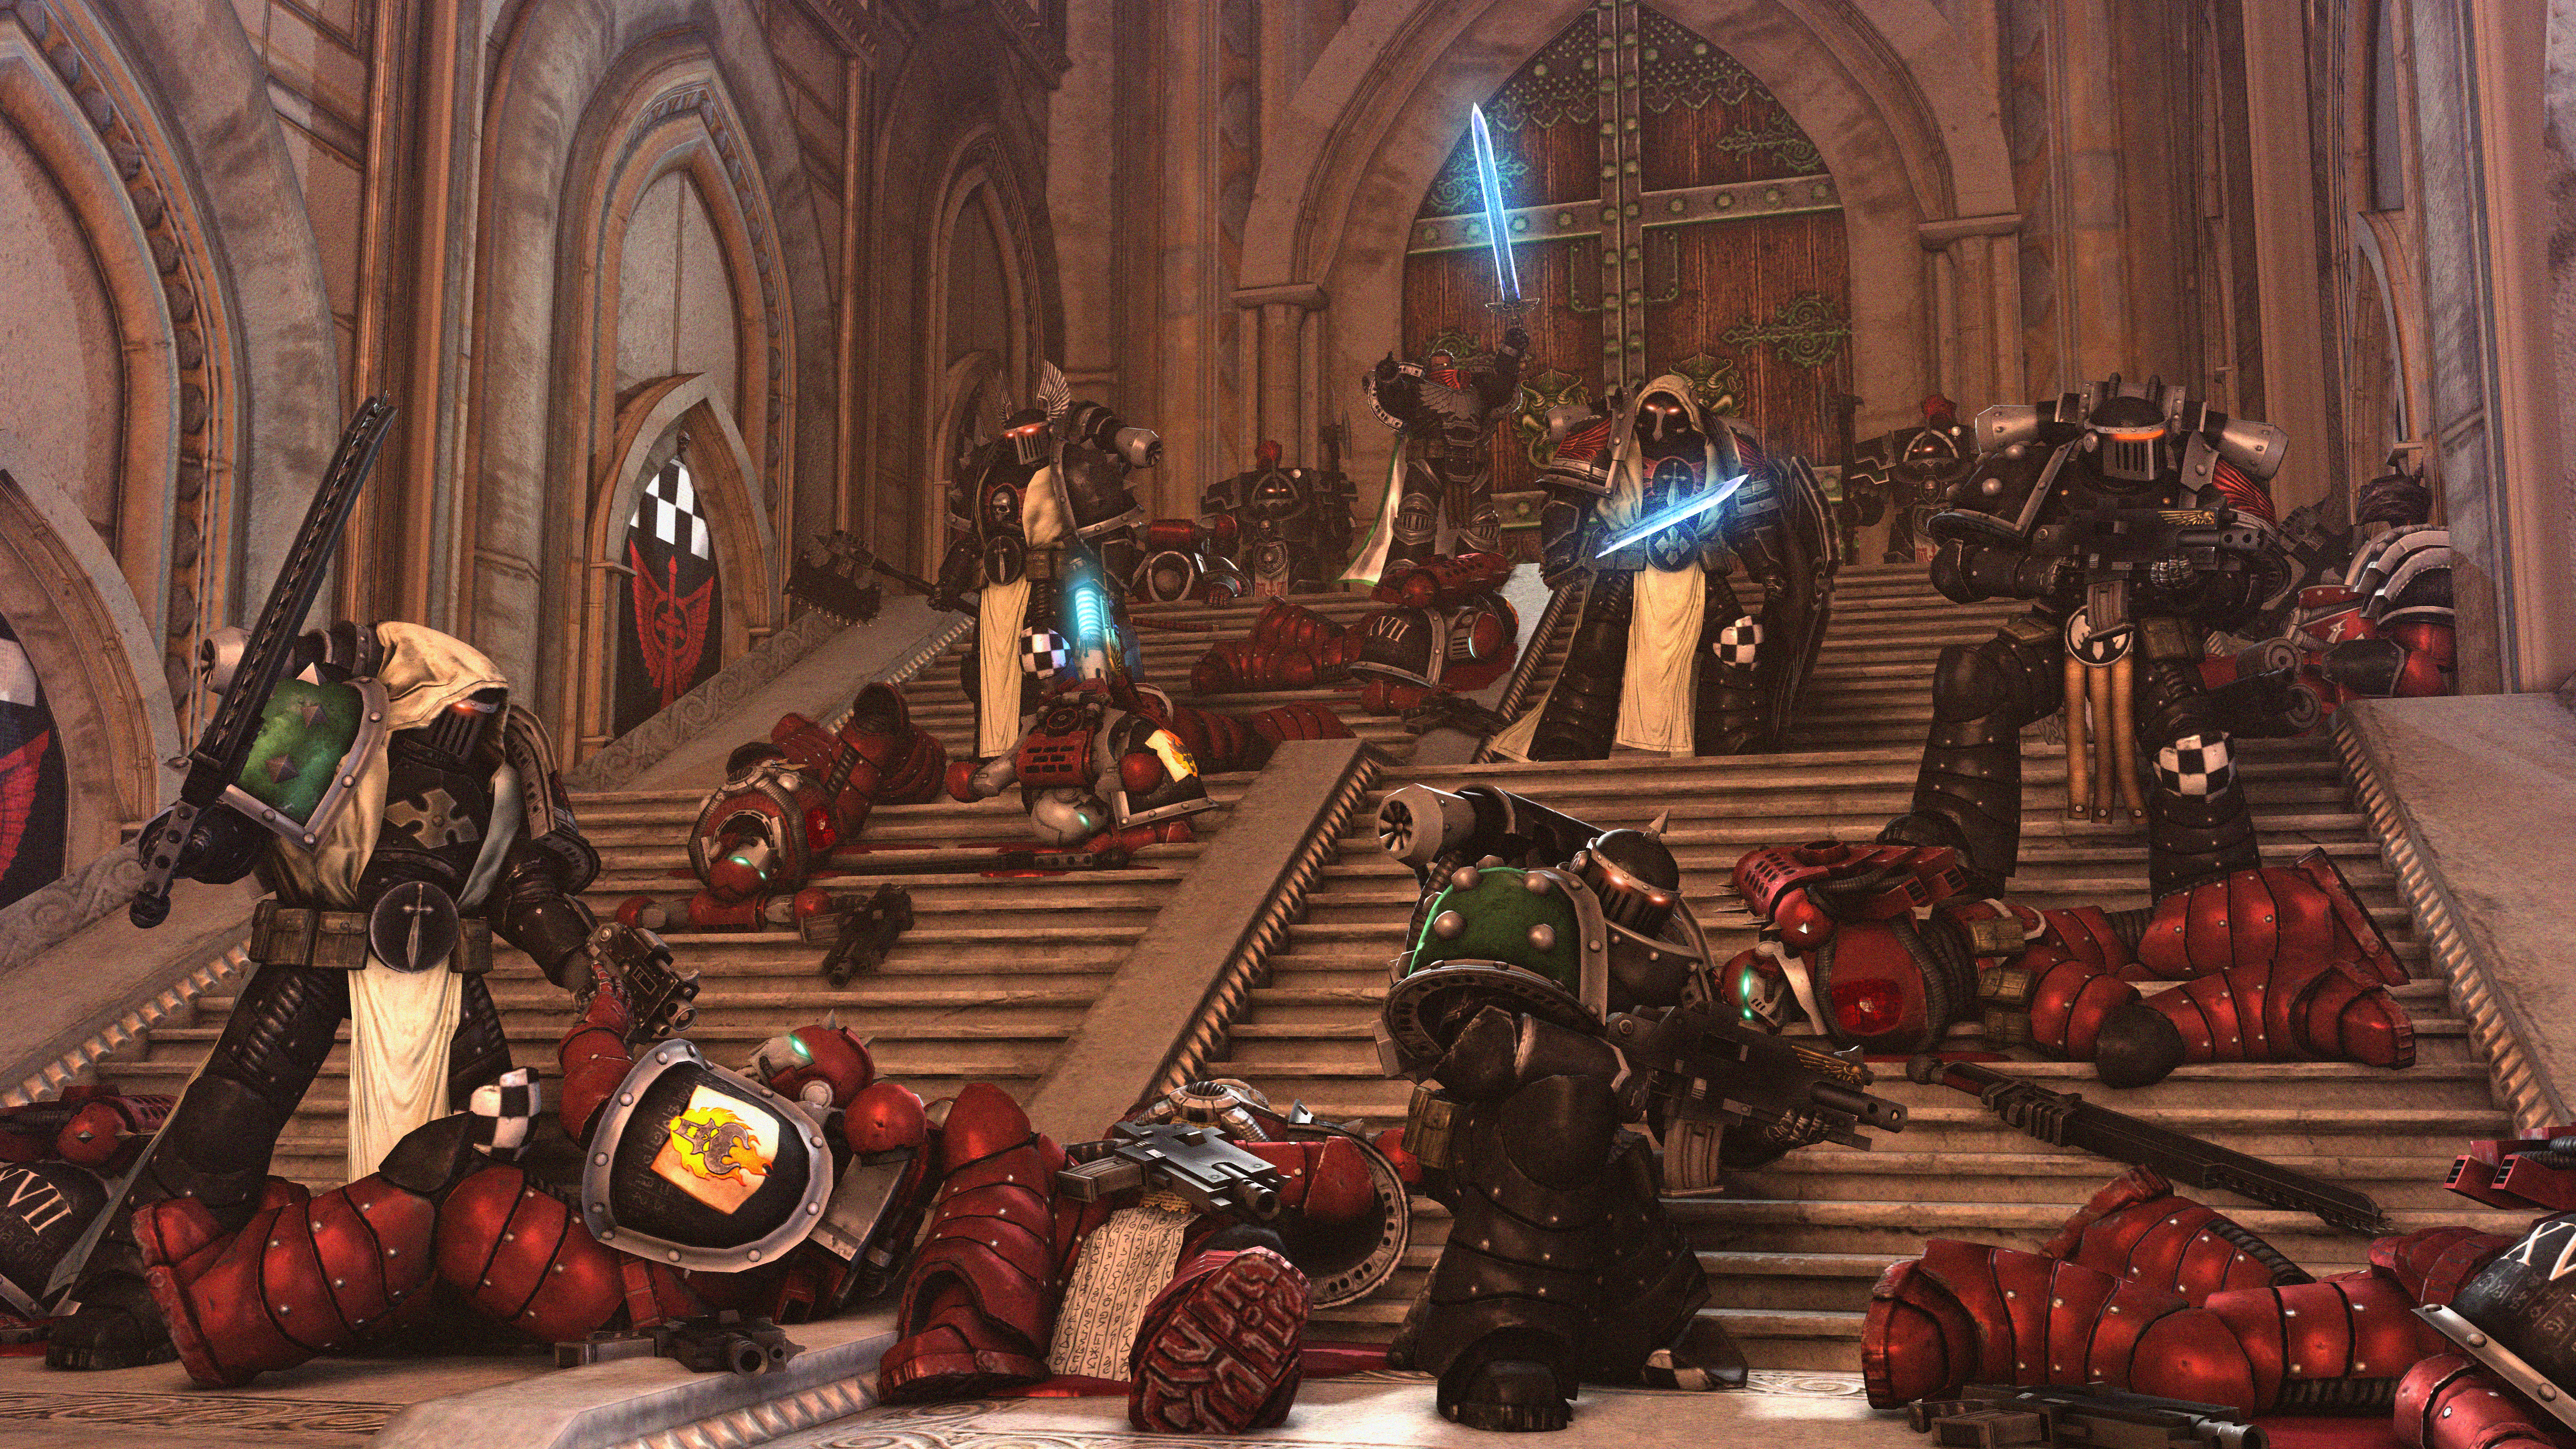 Knights of Caliban (1/2) by WarbringerVI